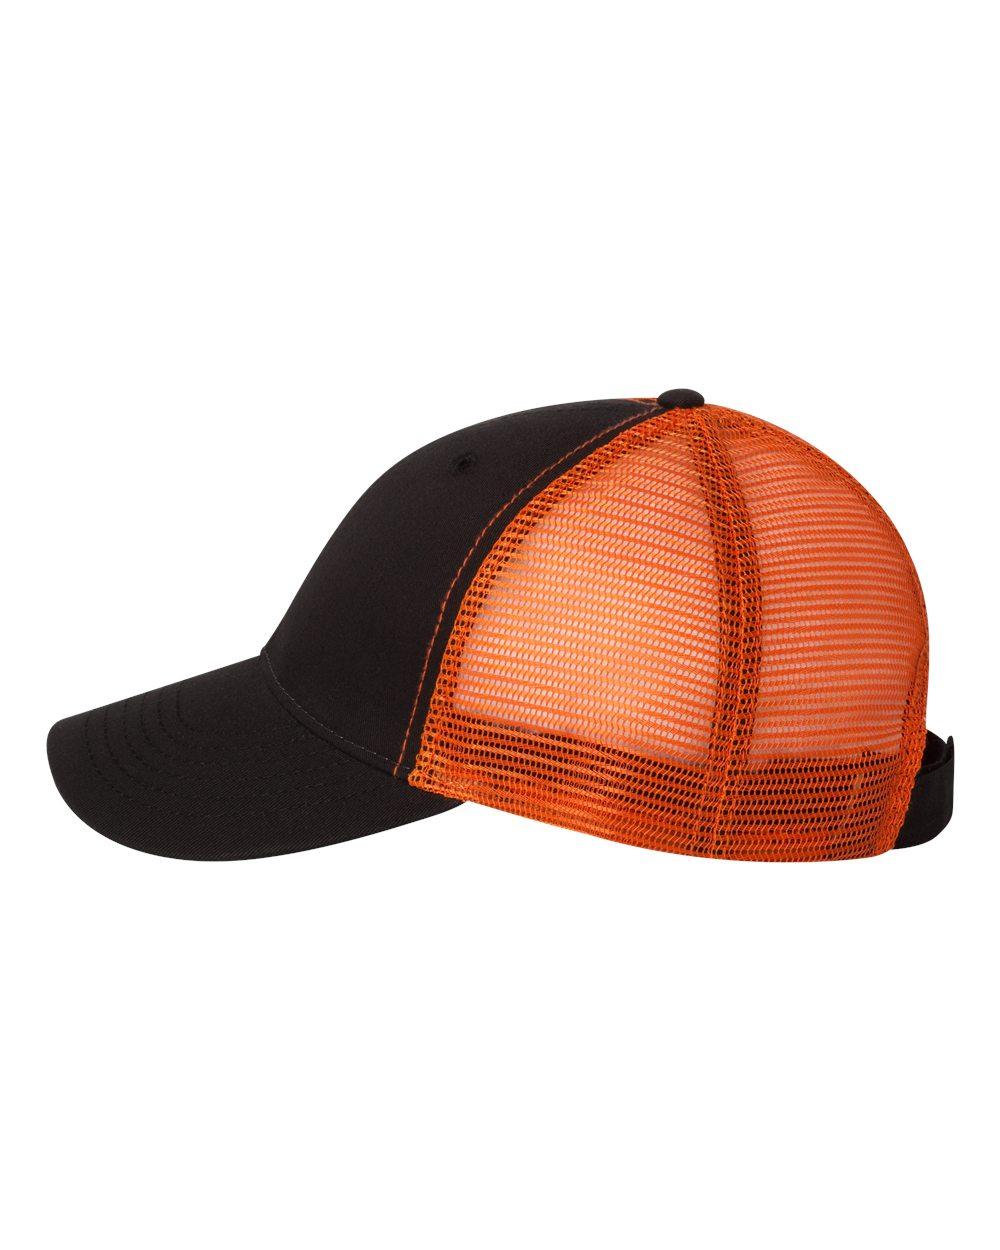 click to view Black/Orange